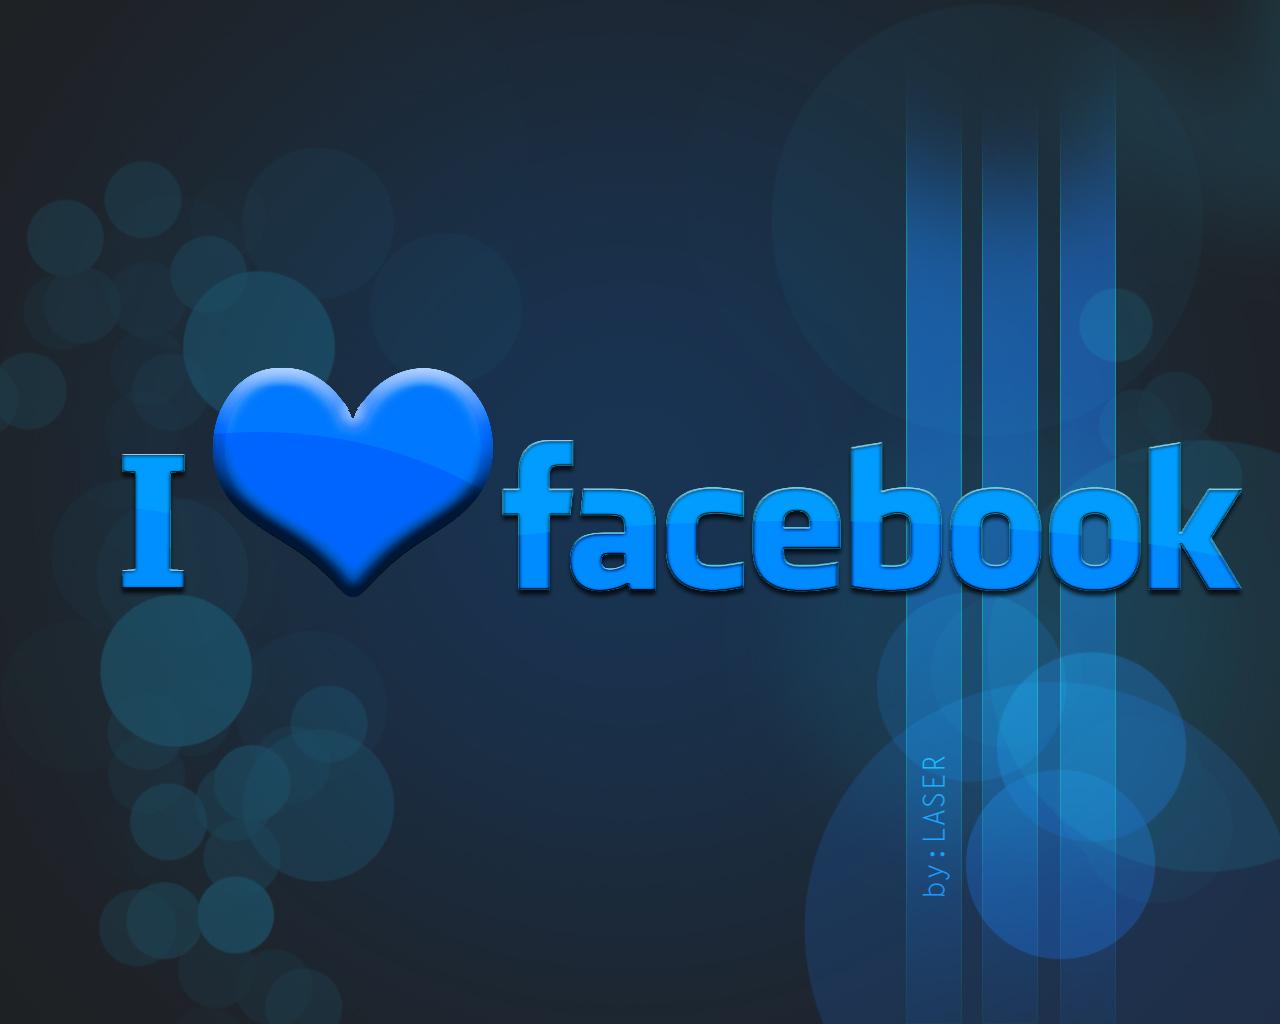 wallpaper friendship facebook - photo #43